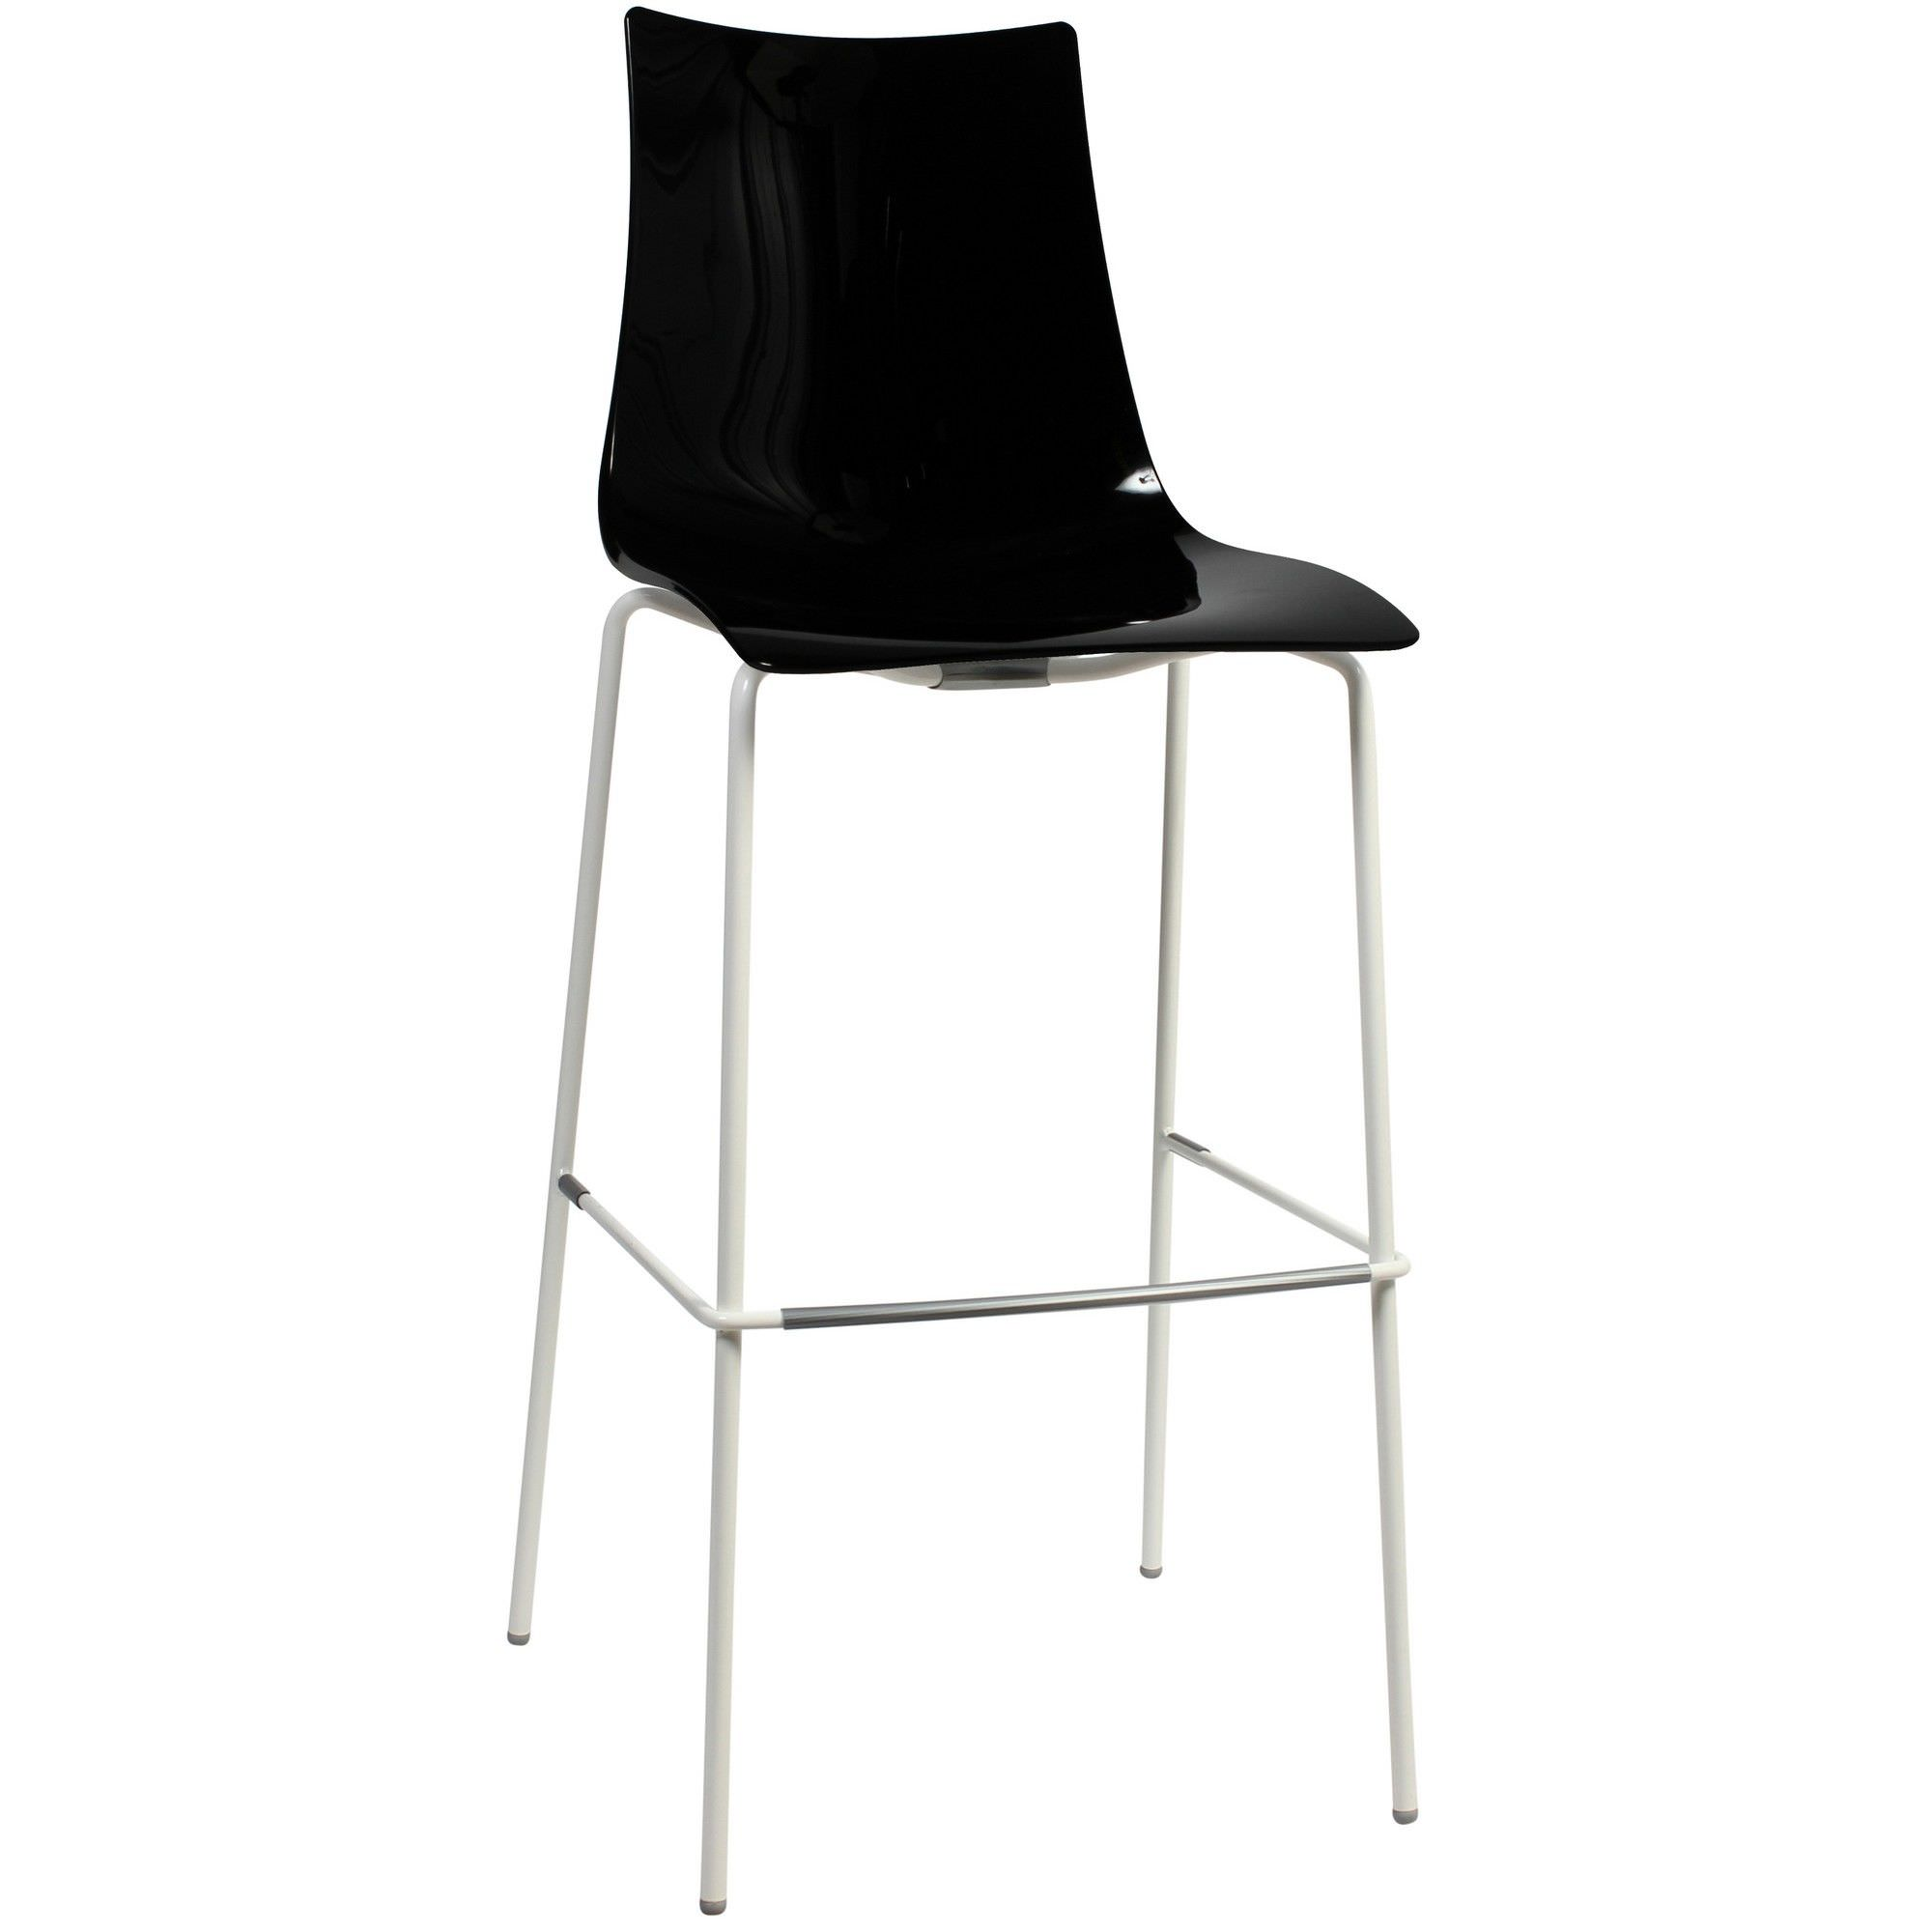 Zebra Italian Made Commercial Grade Indoor/Outdoor Bar Stool, Metal Leg, Black / White